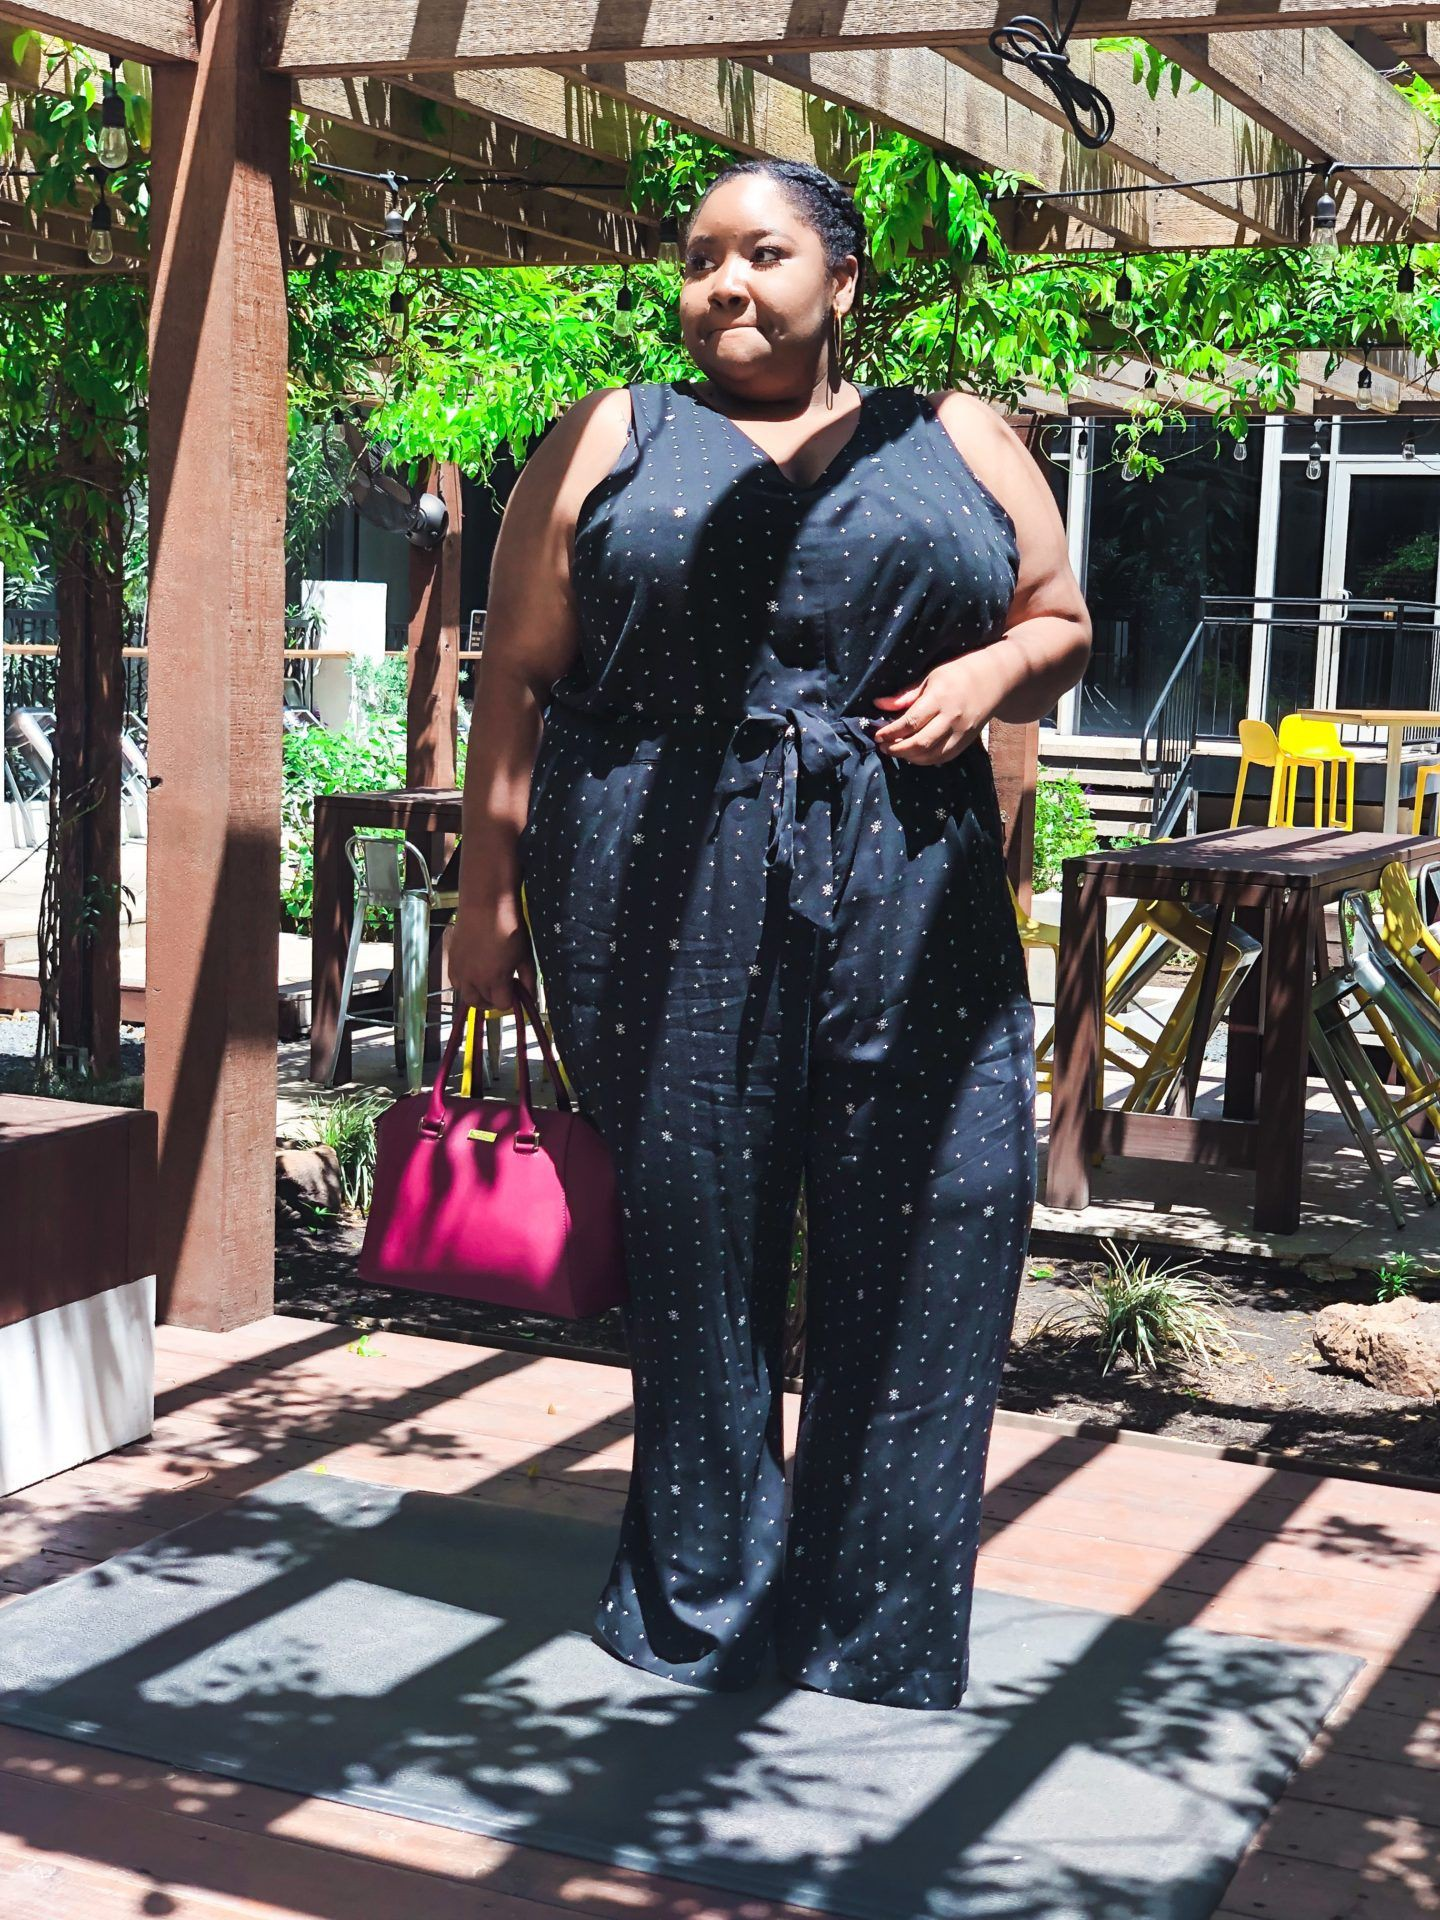 Black lookbook dress with romper suit, denim